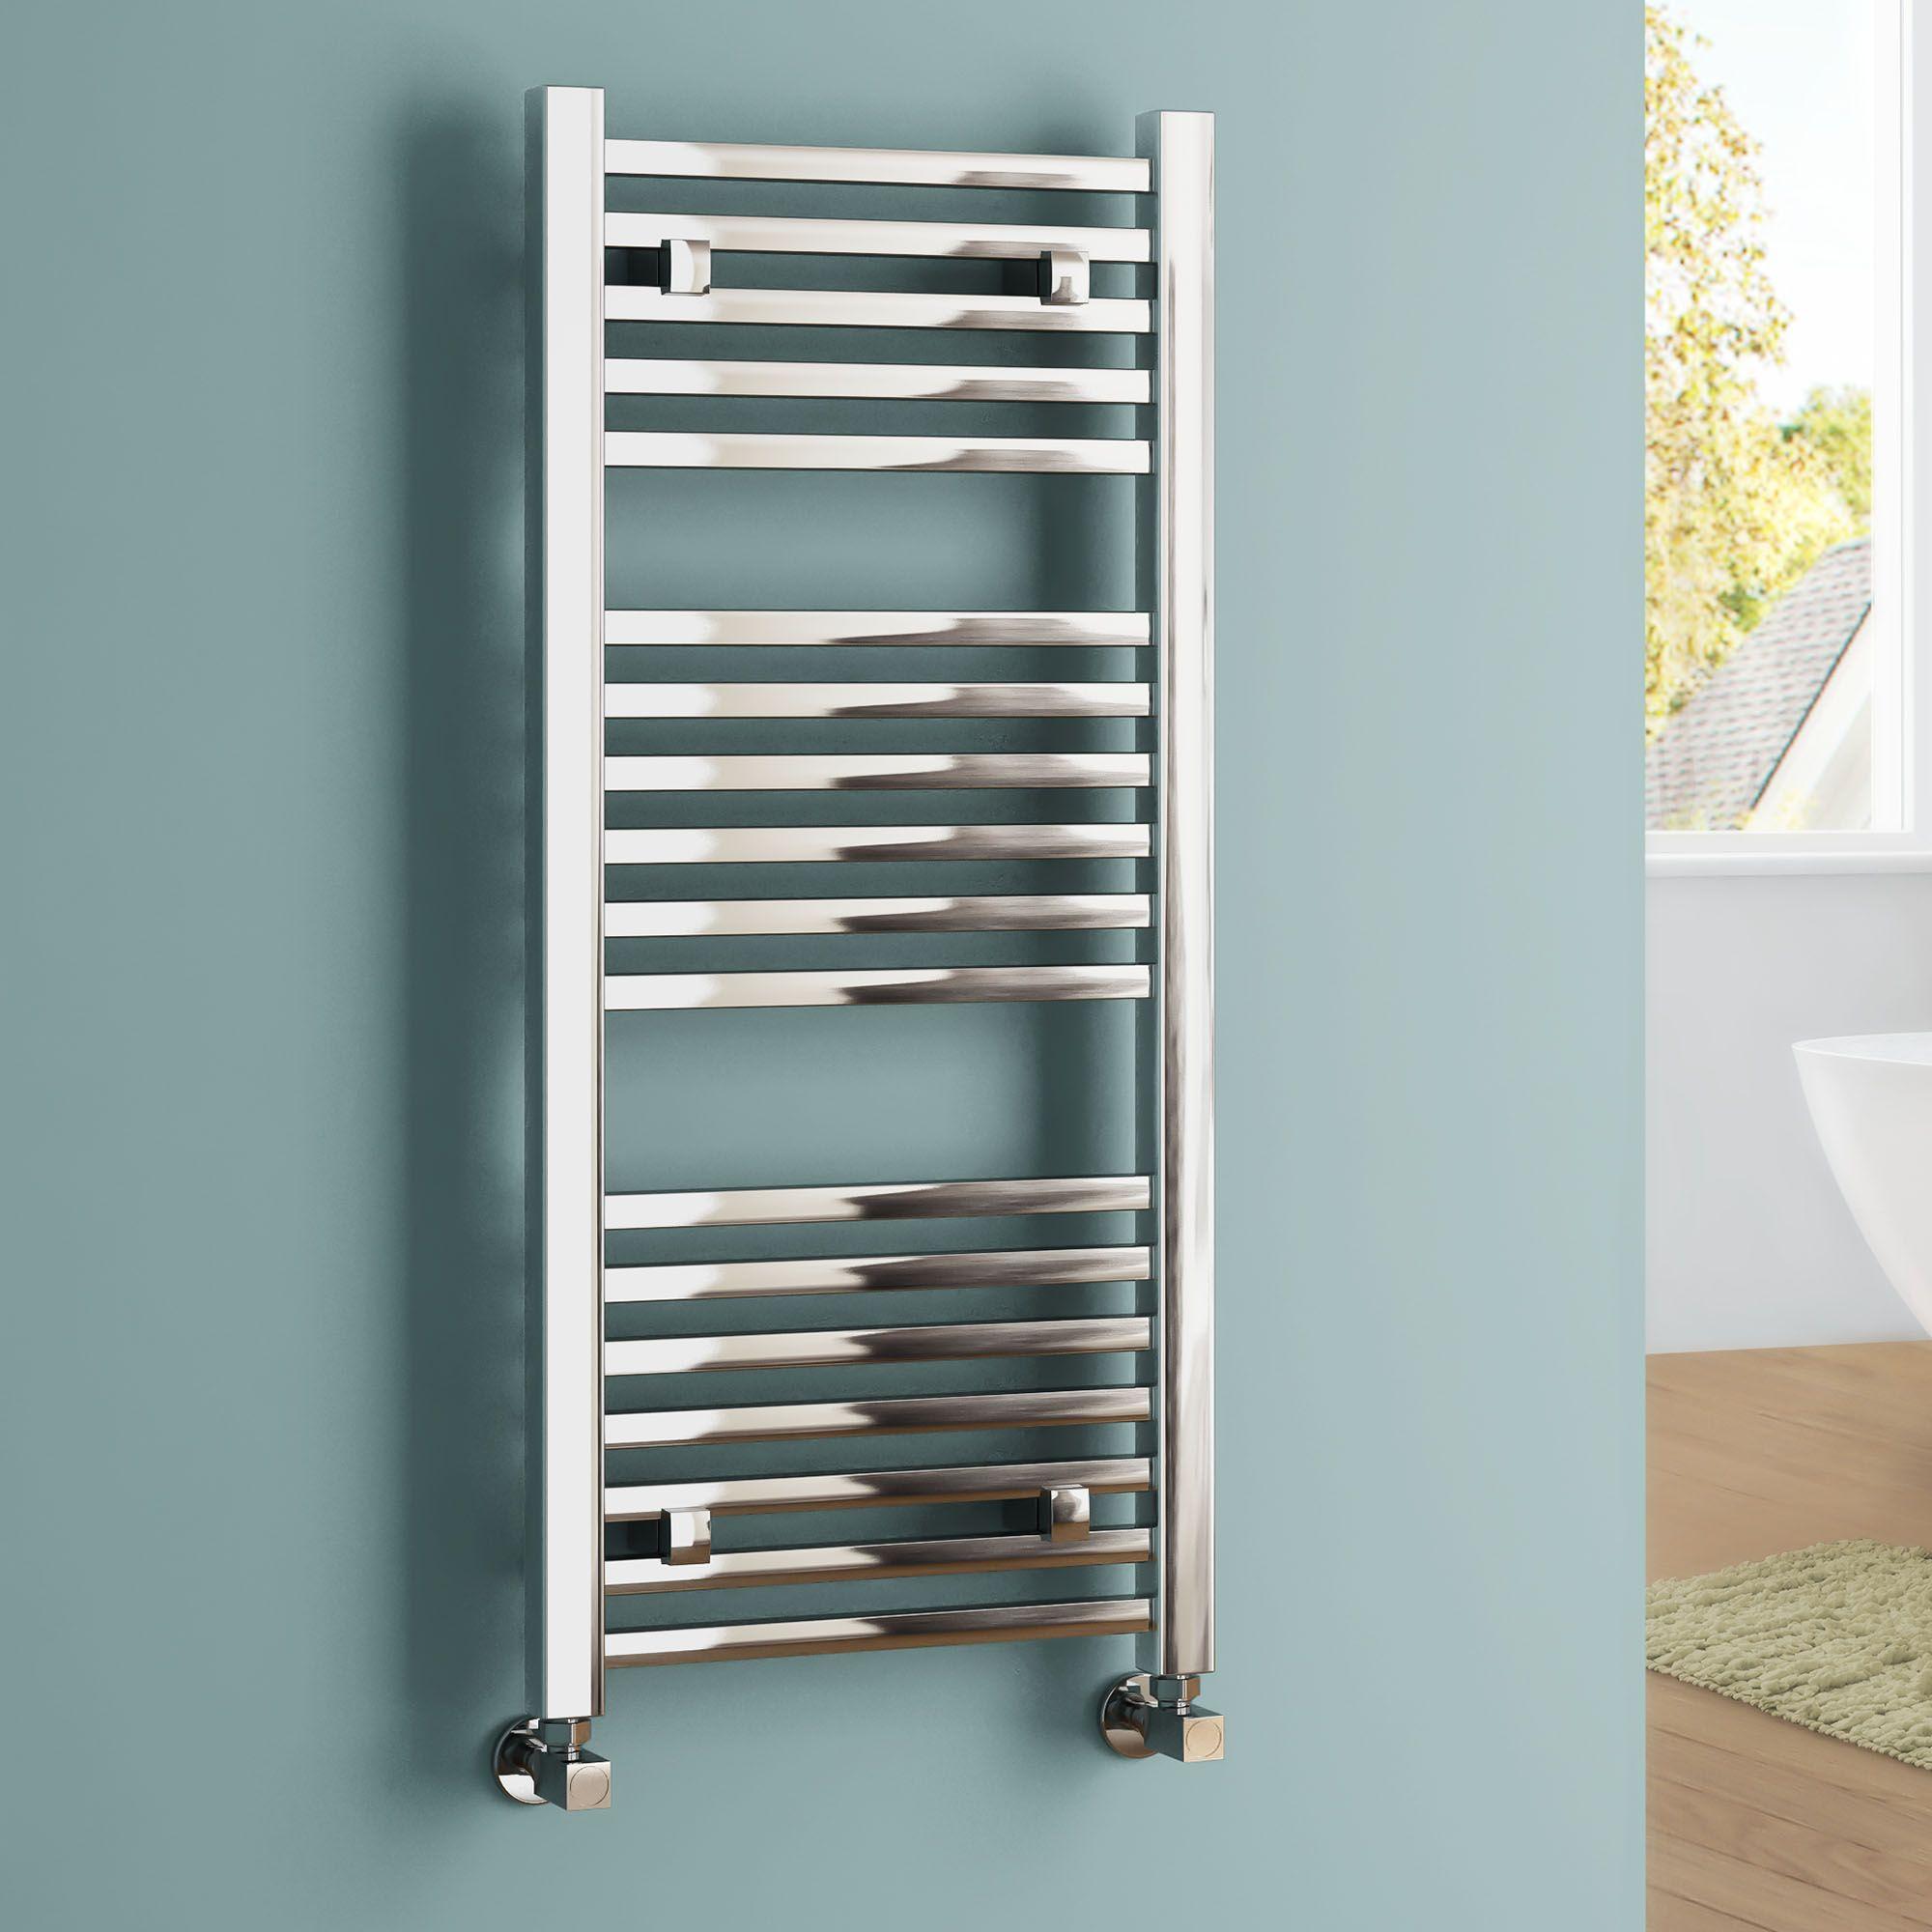 Natasha ladder rail straight modern electric towel radiator in chrome - Square Ladder Rail Contemporary Towel Radiator In Chrome 1000mm X 450mm